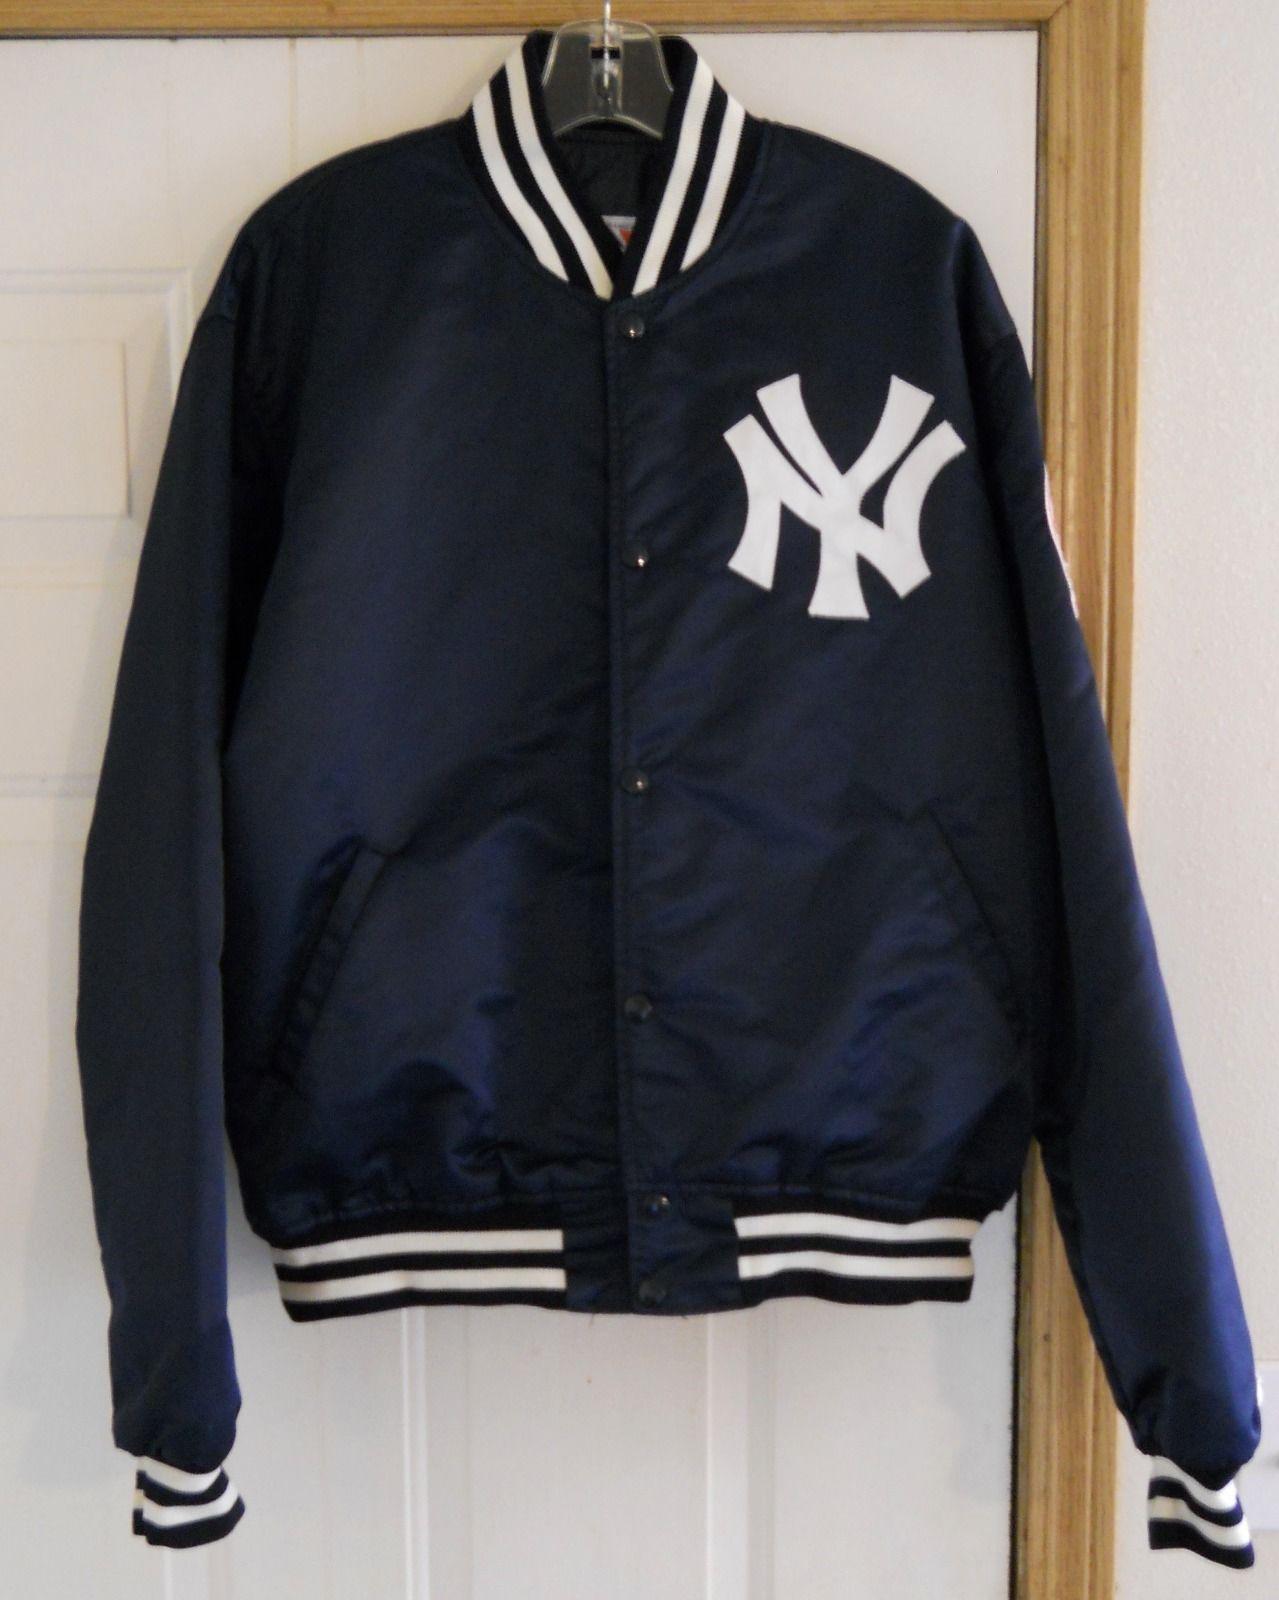 6da8b21b4 Vintage New York Yankees Starter Jacket XL MLB | eBay [SOLD ...